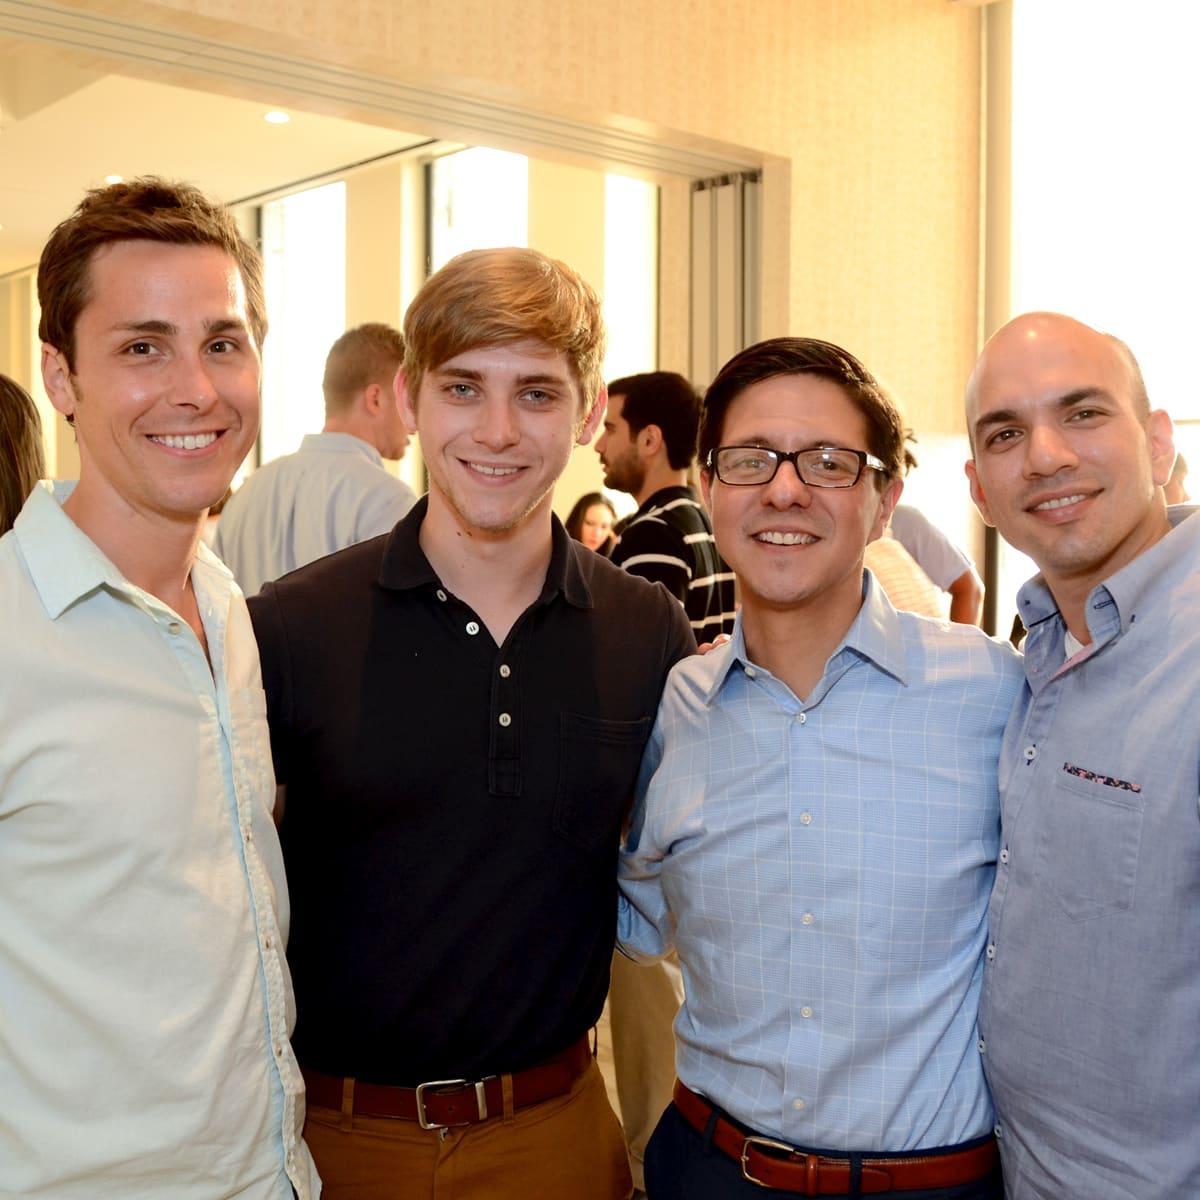 YP Zoo Aug 2015 Brandon Weinbrenner, Mitchell Greco, Nick Espinosa, Carlos Meltzer